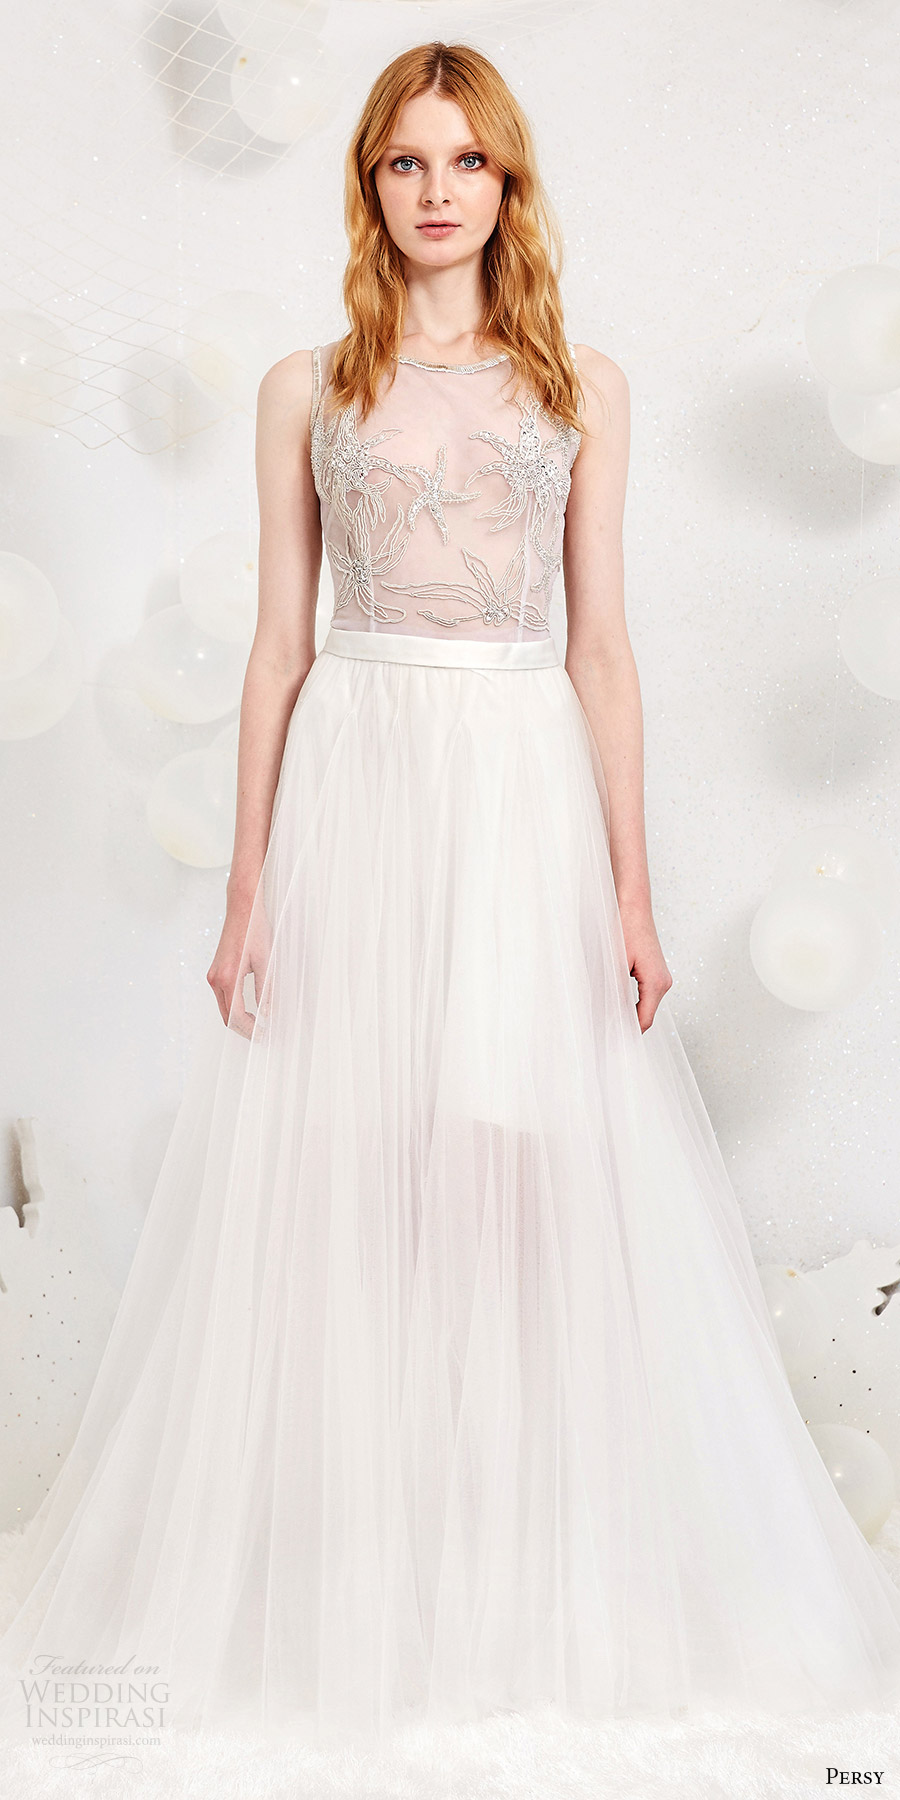 Parisian Wedding Dresses 40 Trend persy spring bridal sleeveless